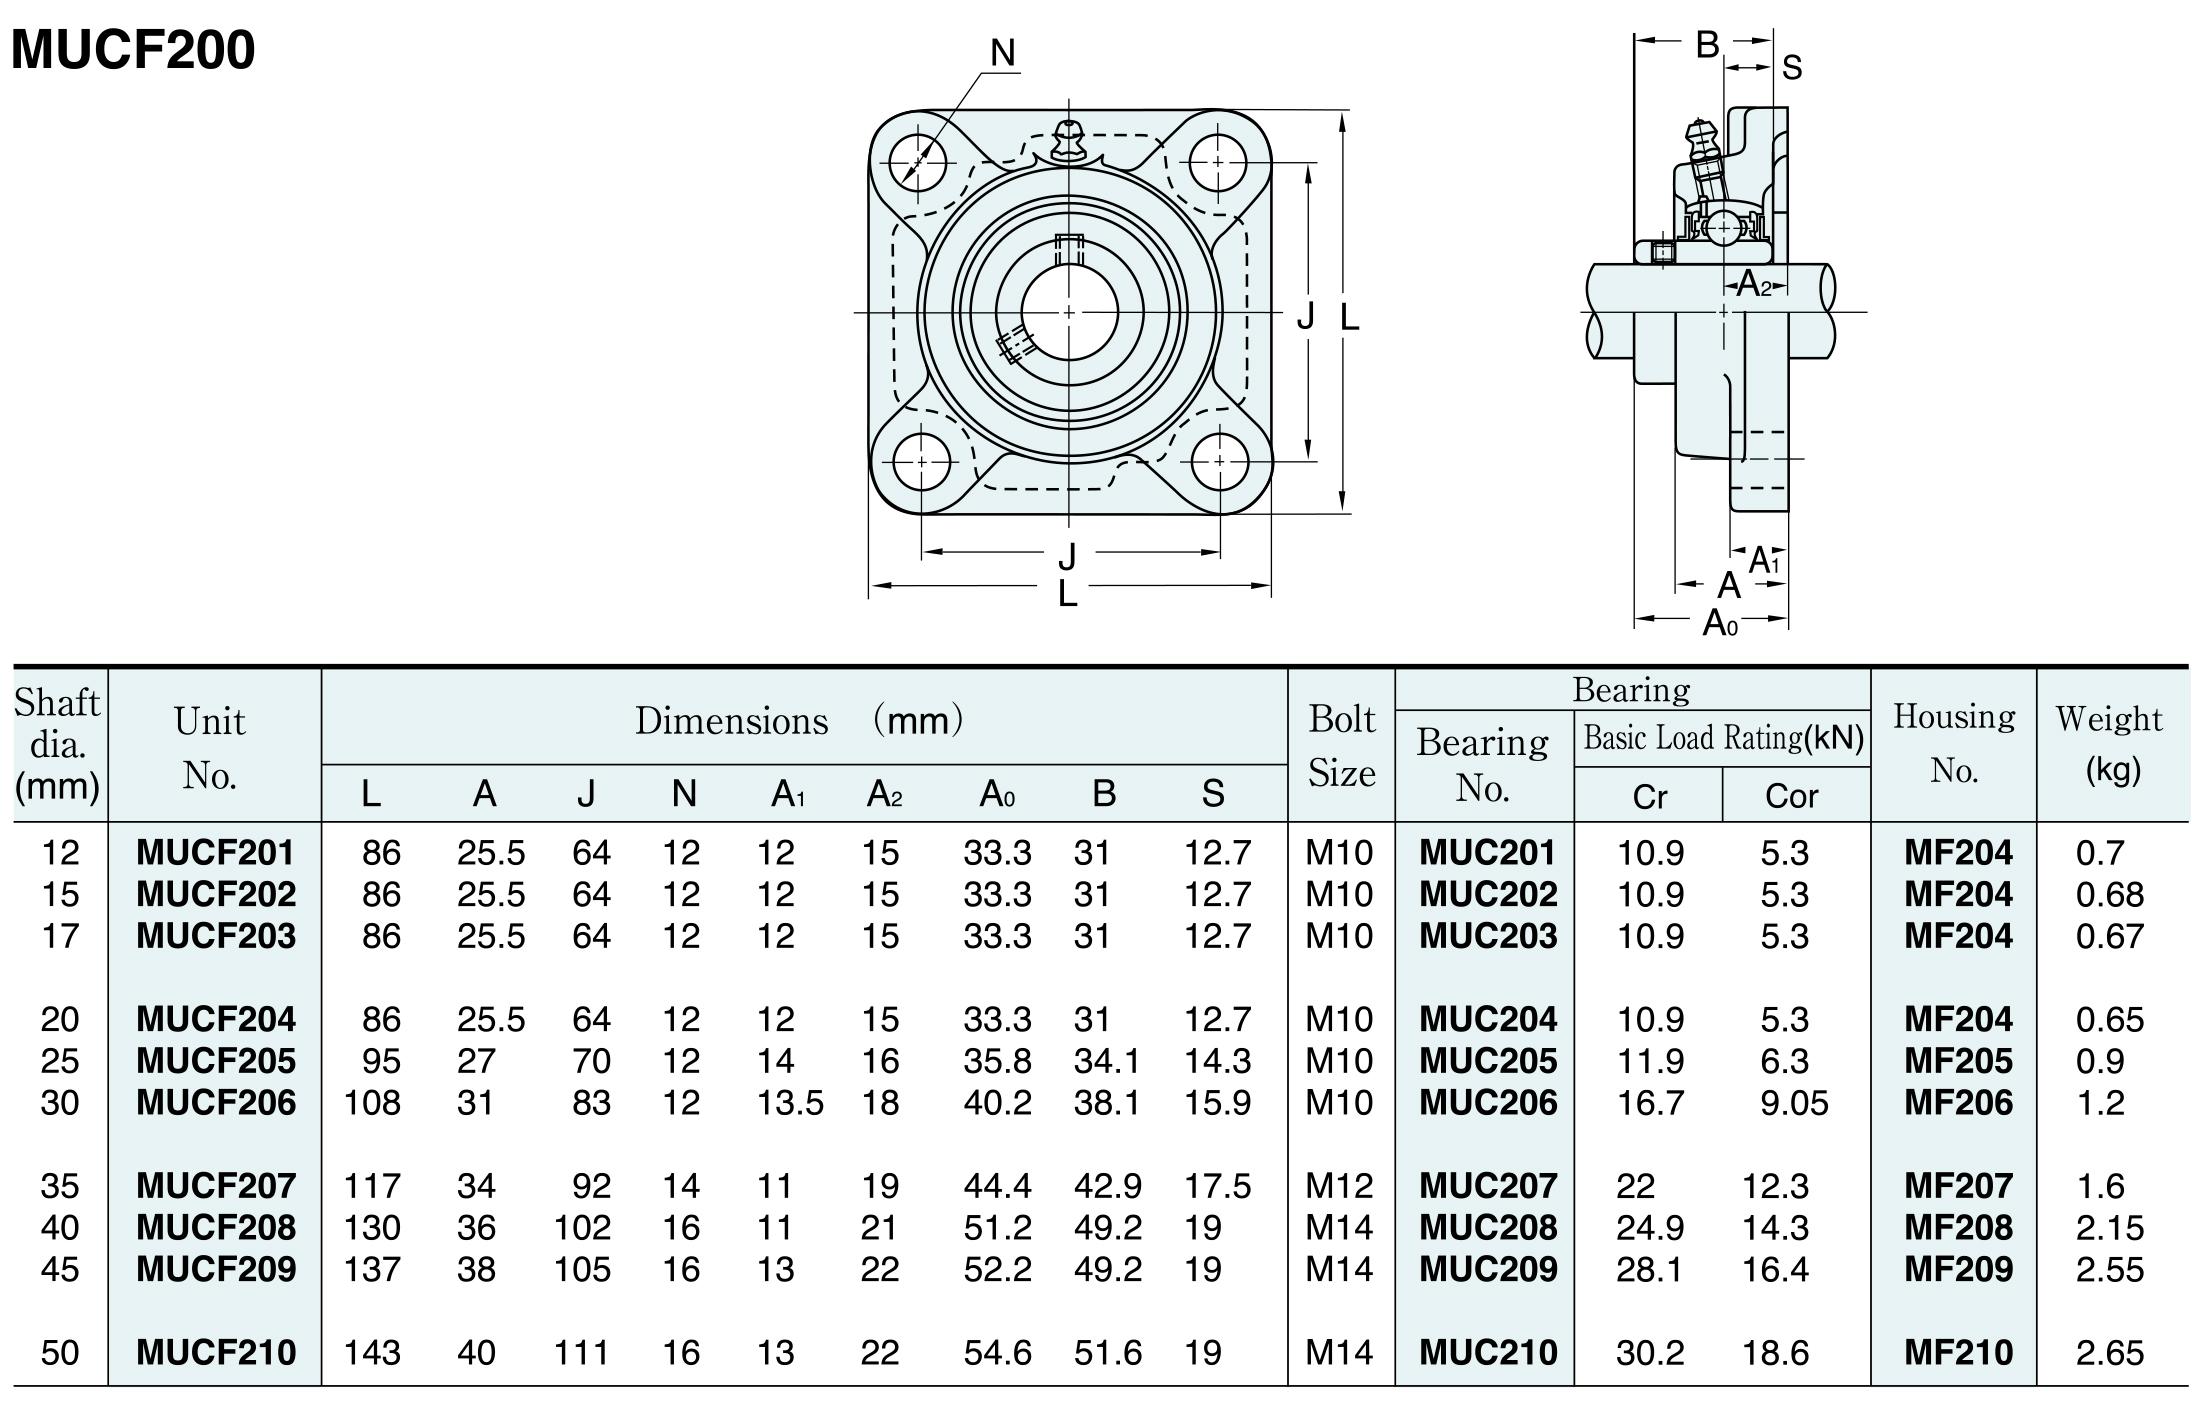 MUCF200 rozměry